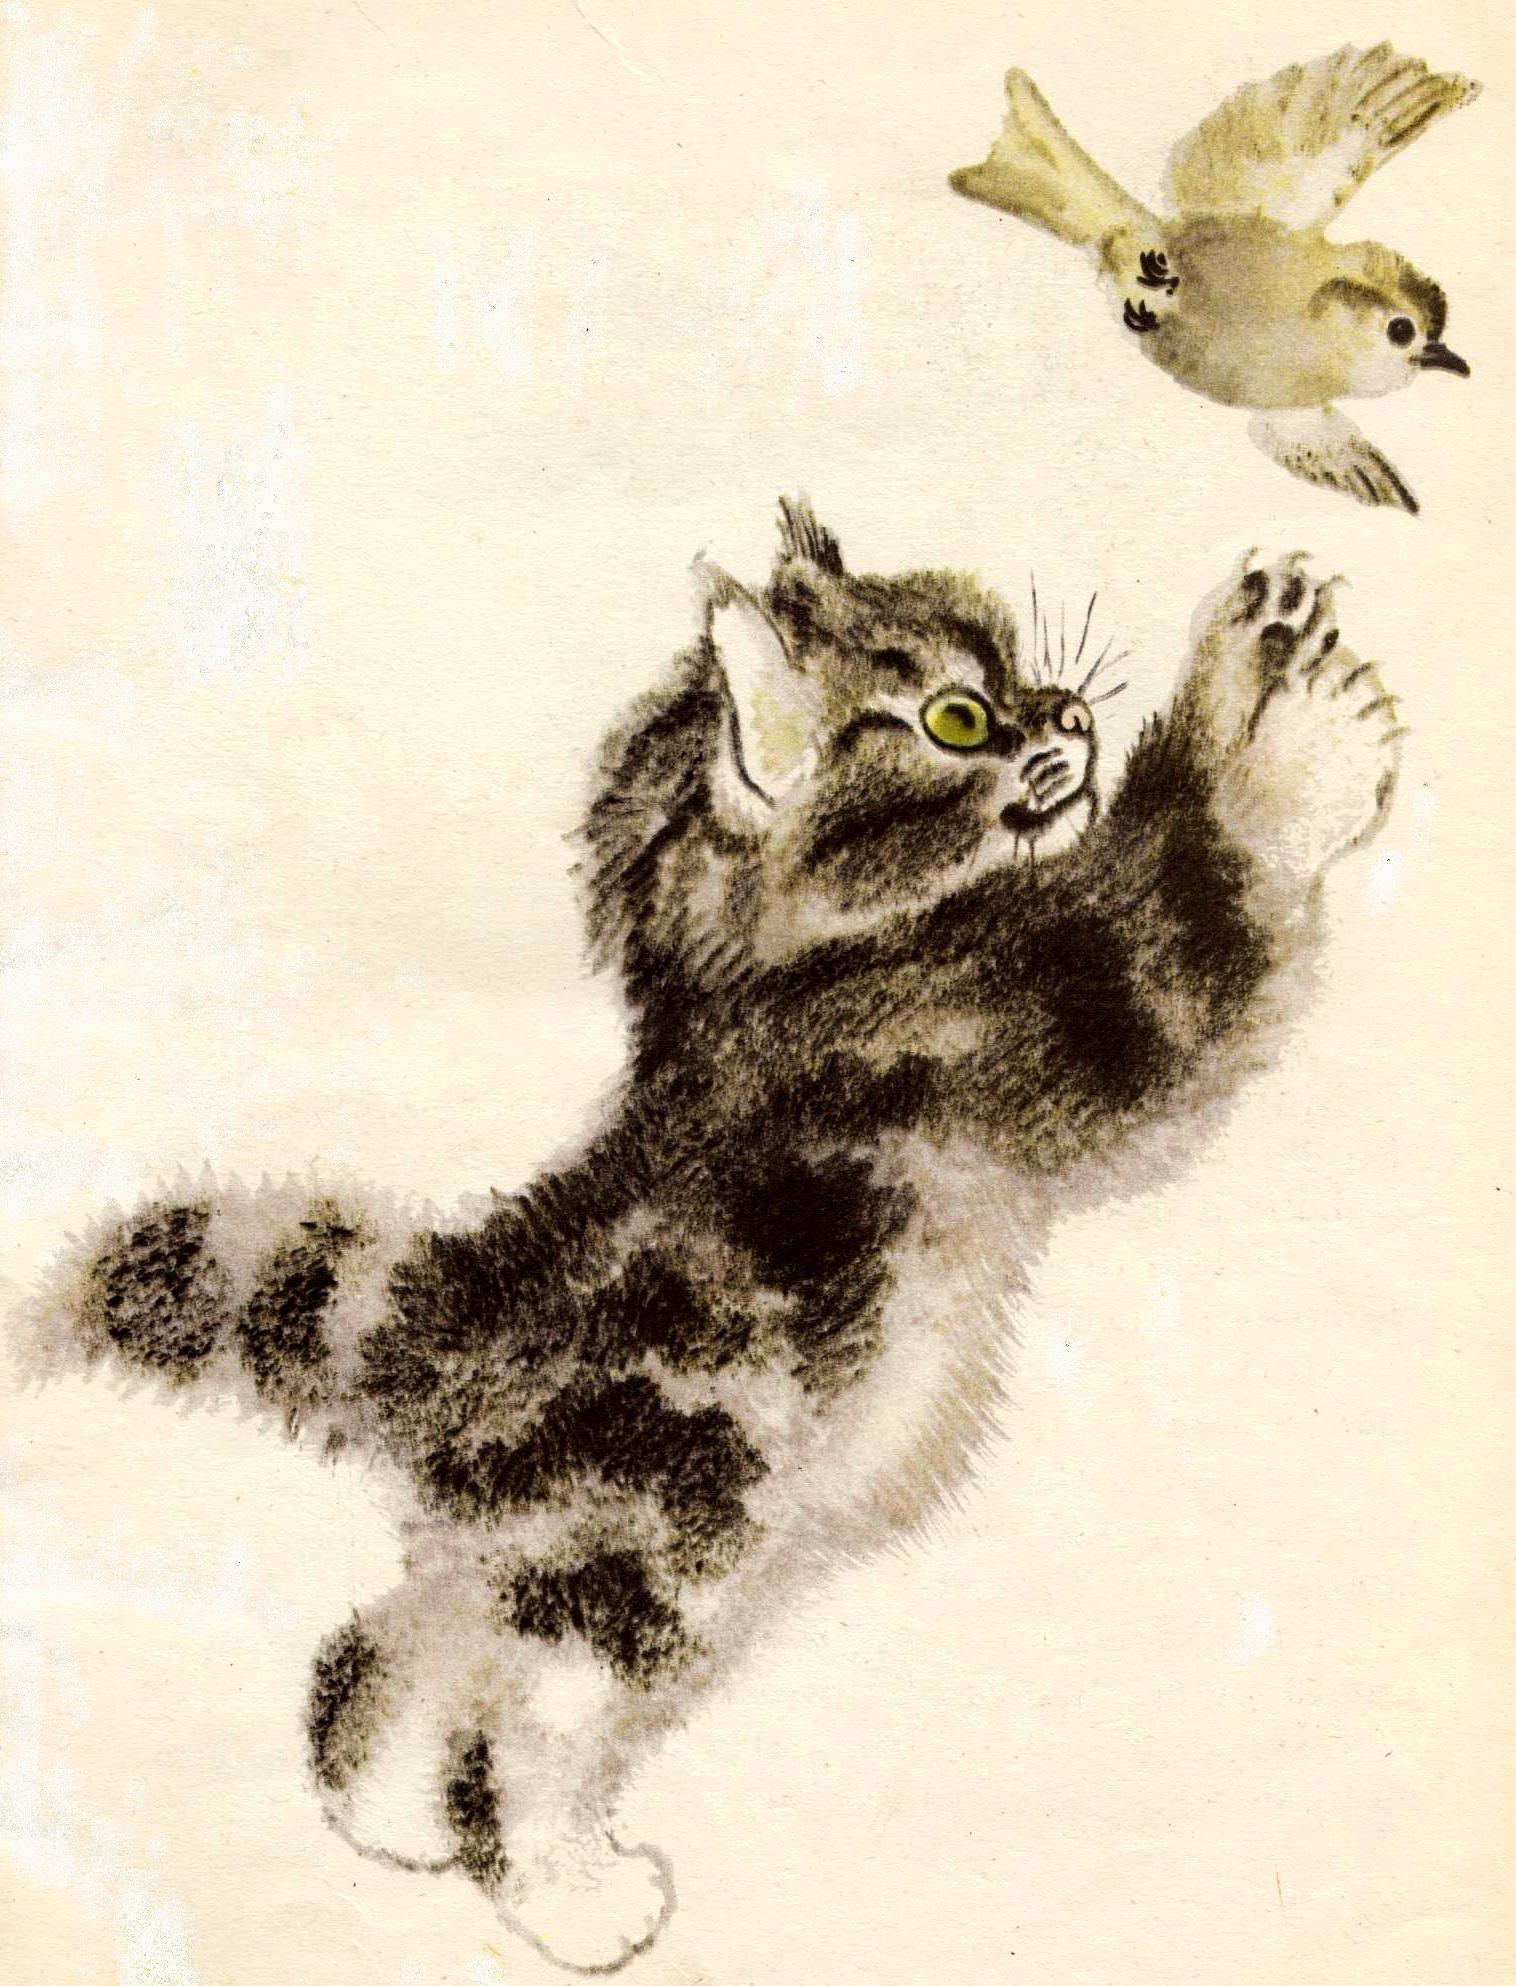 евгений чарушин рисунки животных взял марка рычаги